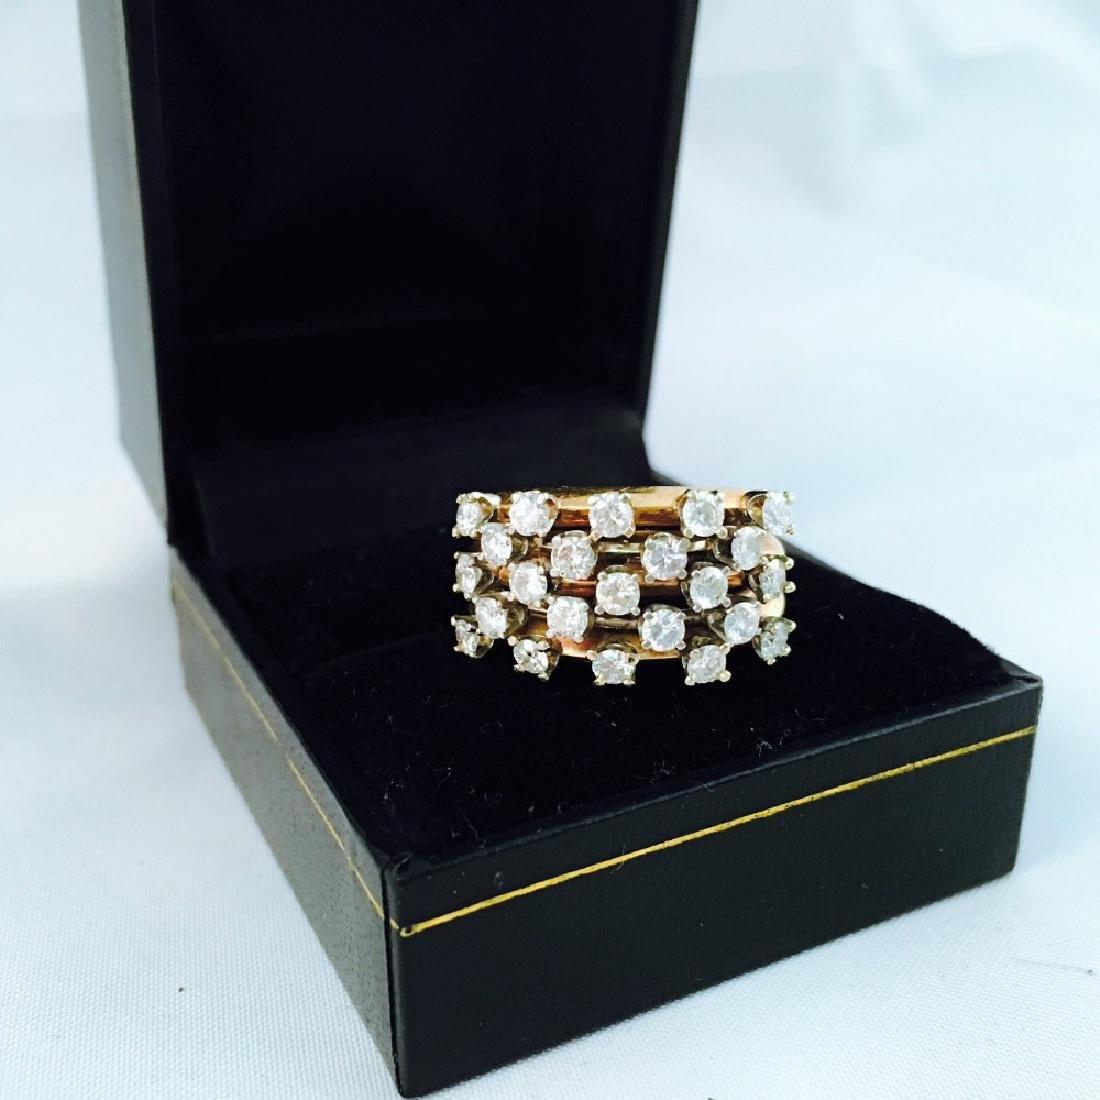 14k Gold, White Diamond Cocktail Ring - 5